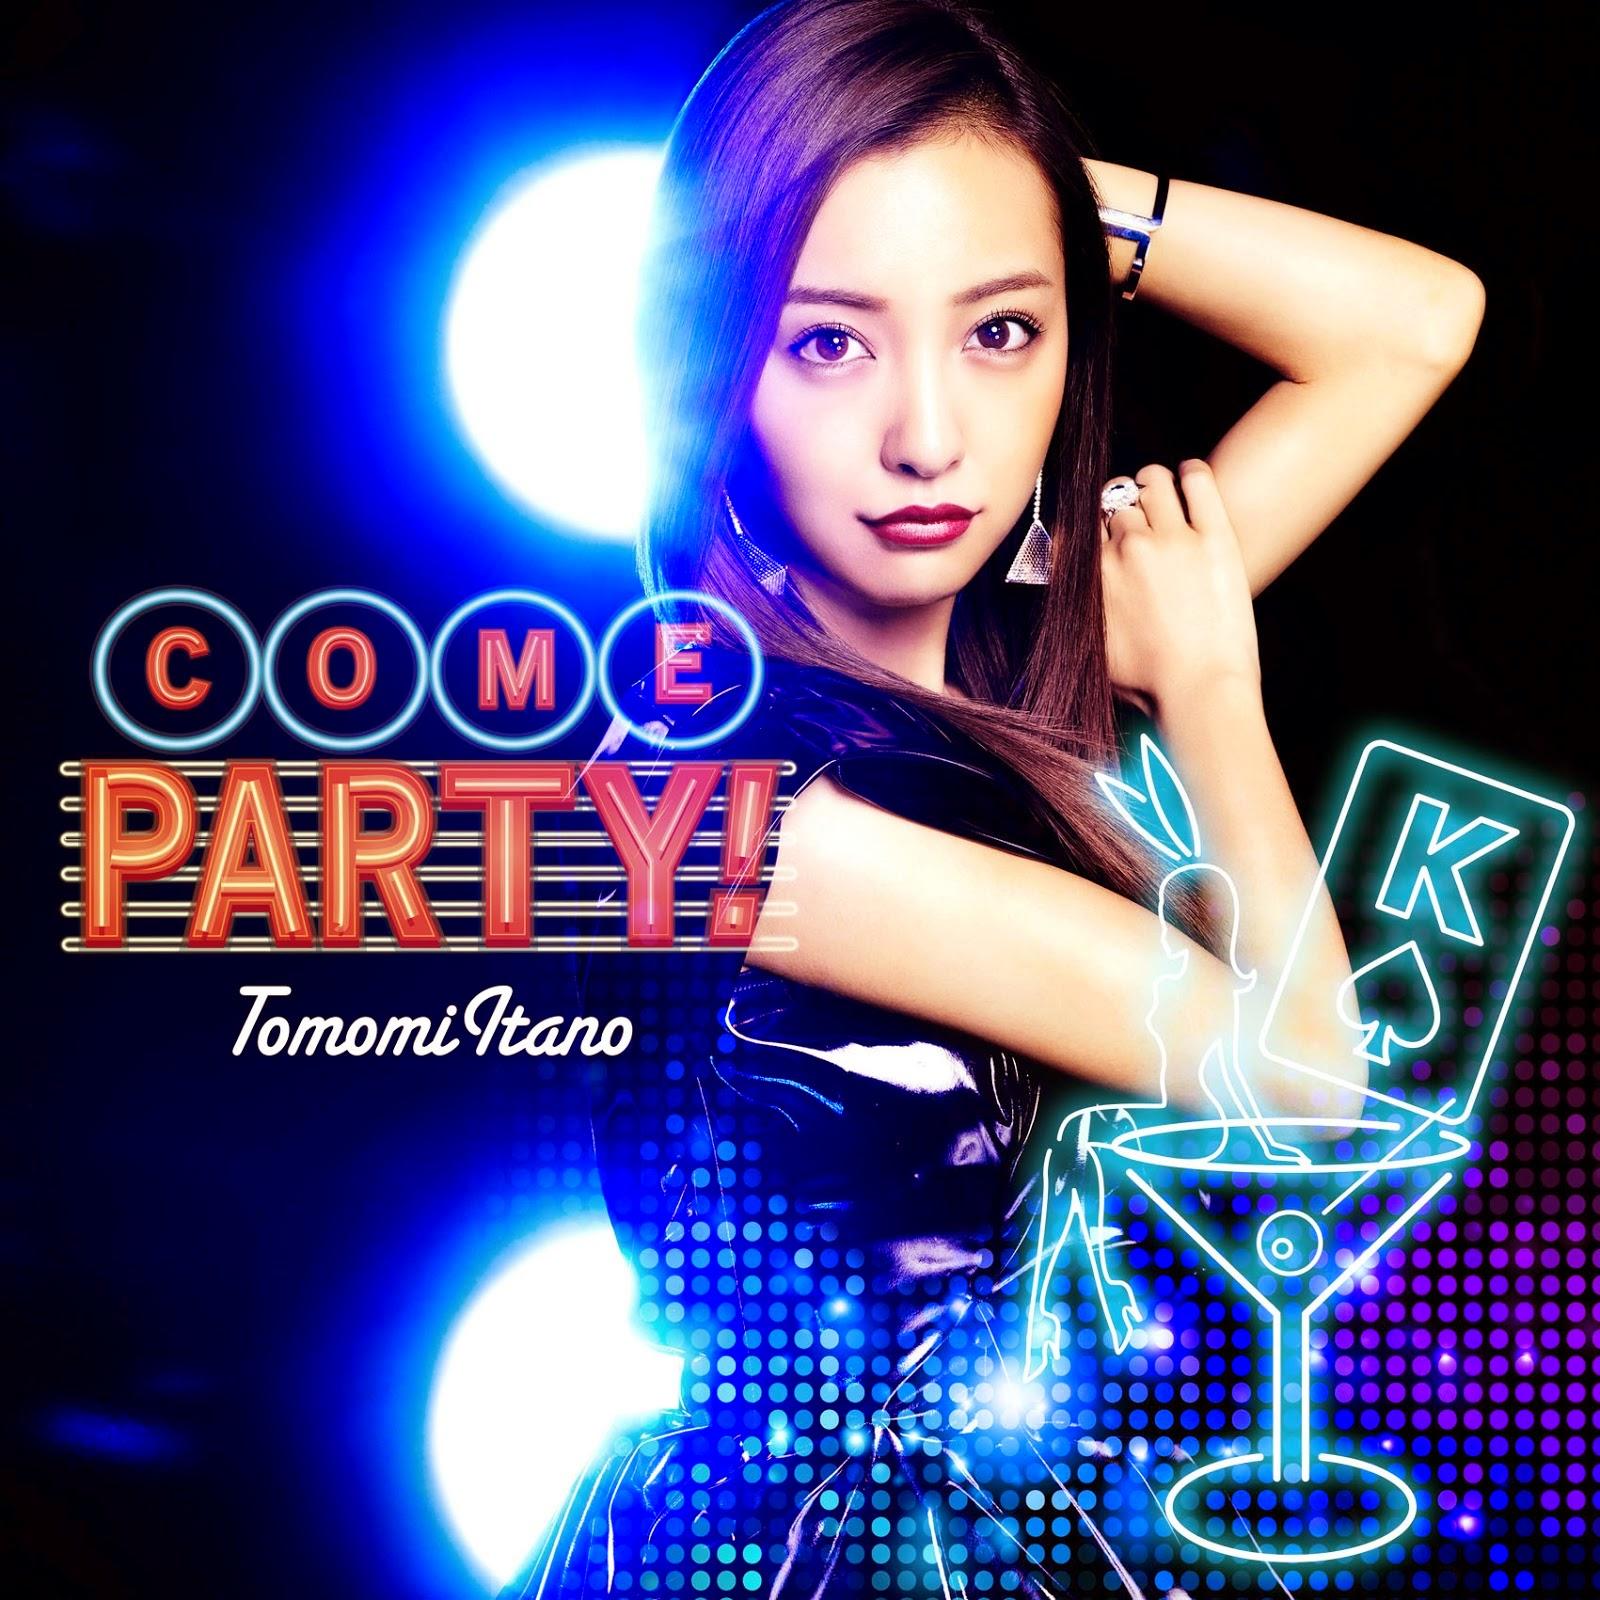 AKB48 LOVER !!: [Download] Itano Tomomi - COME PARTY! [PV]